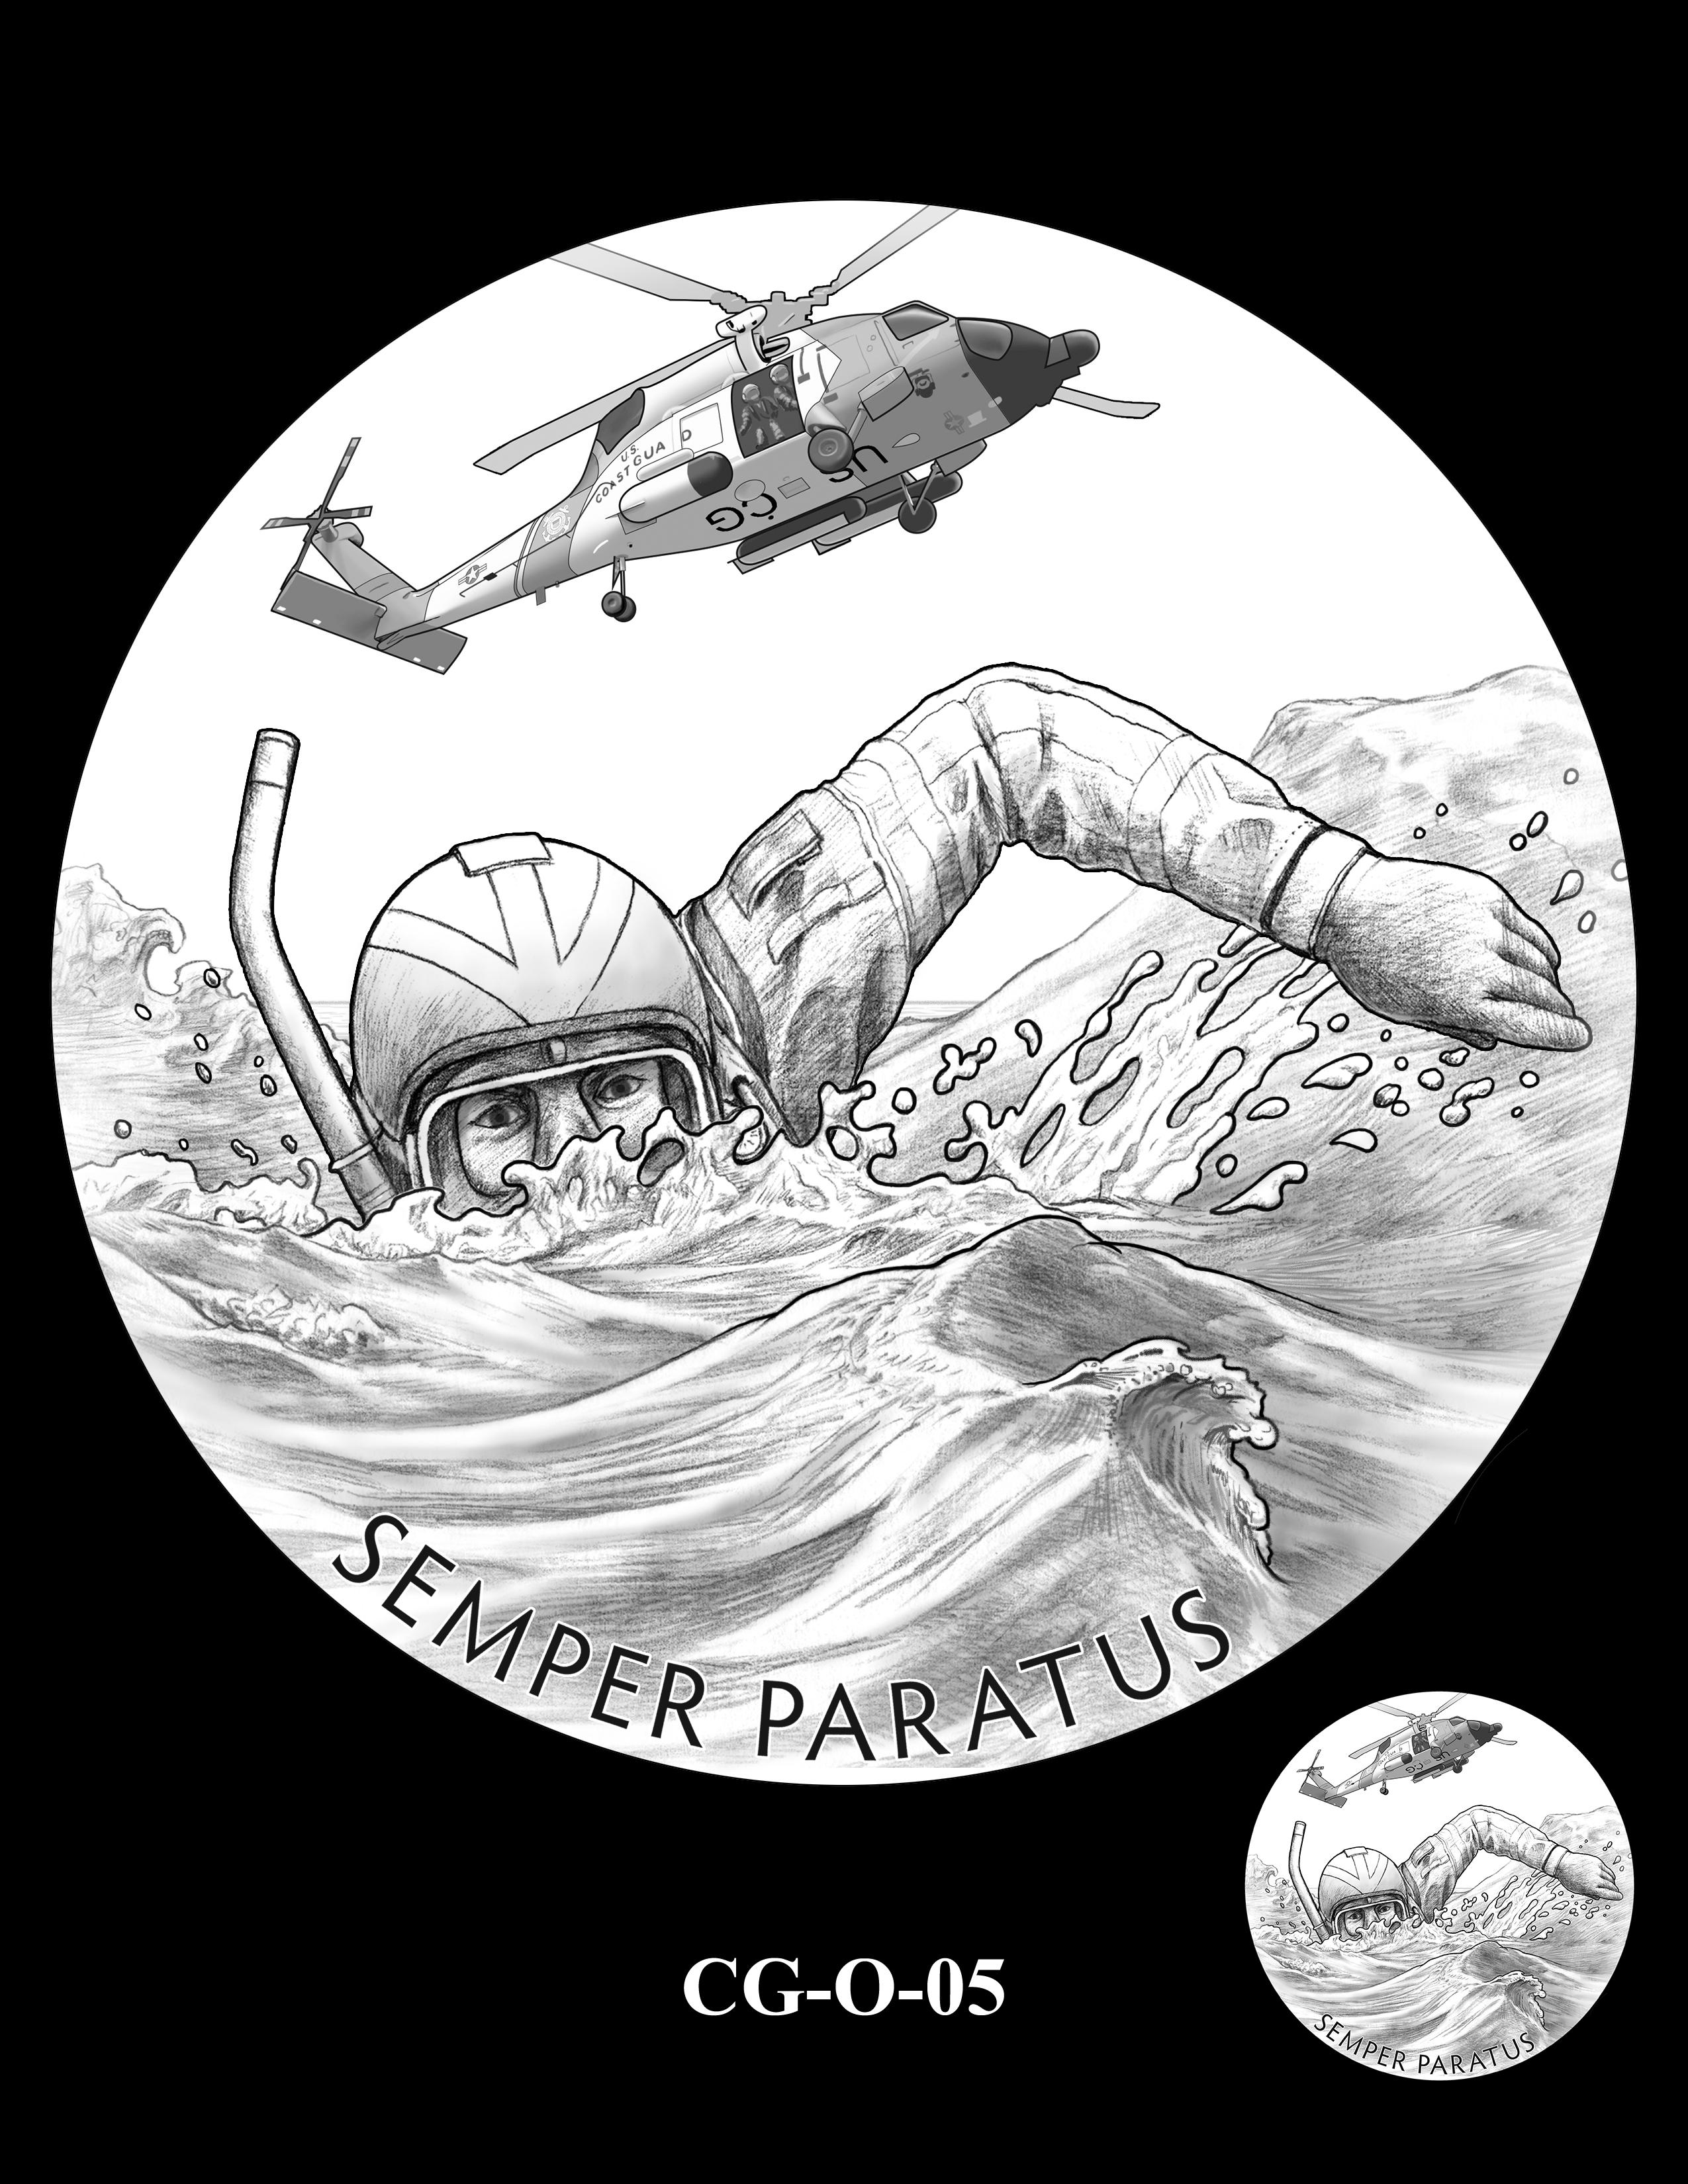 CG-O-05 -- Armed Forces Medal - Coast Guard